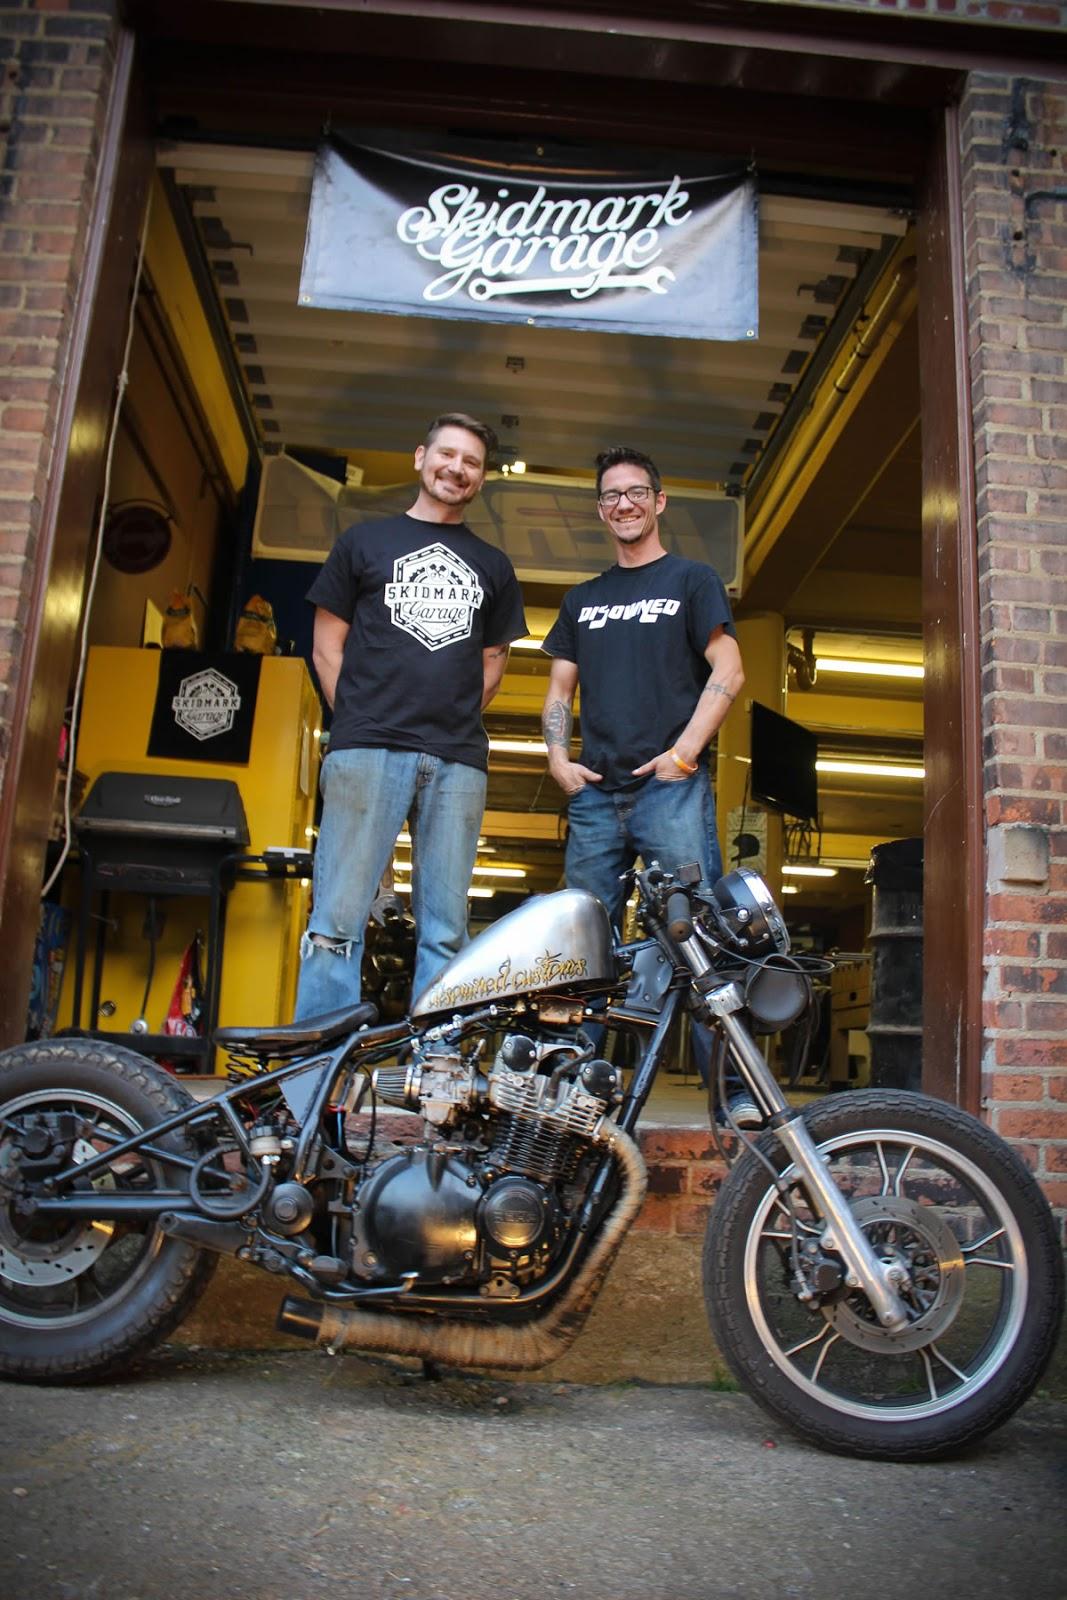 Brian and Dani at Skidmark Garage